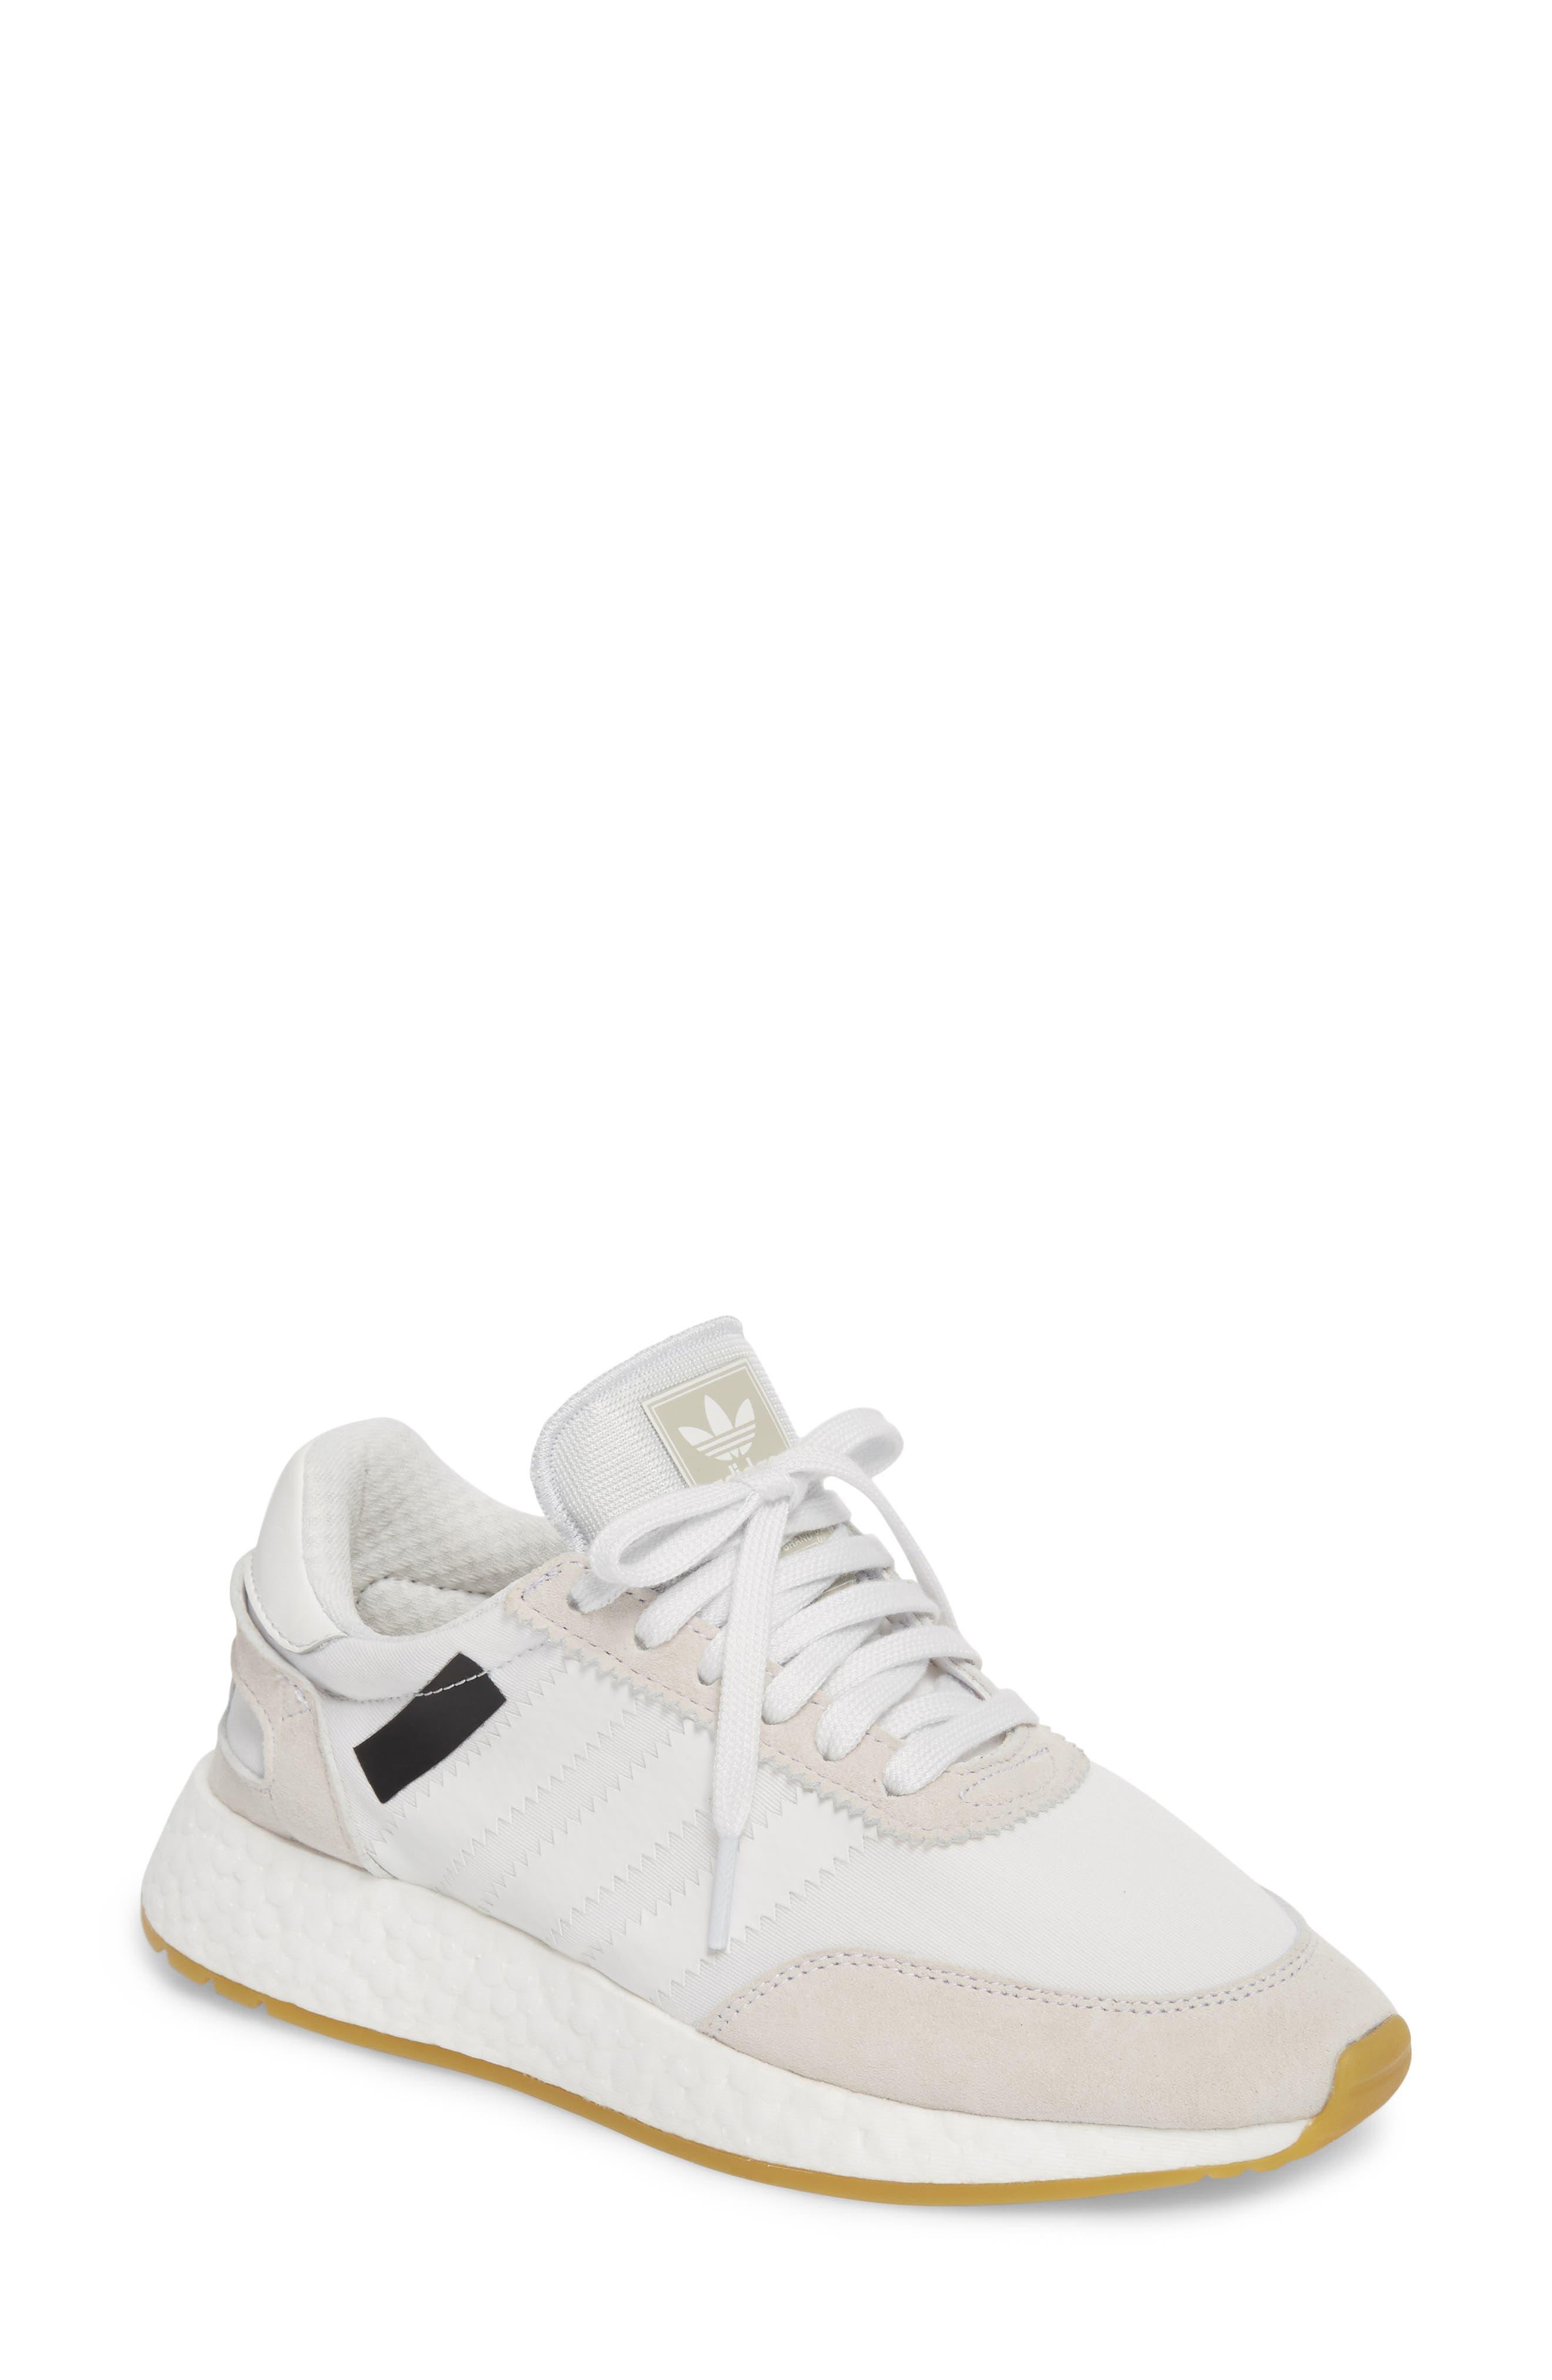 I-5923 Sneaker,                         Main,                         color, 100